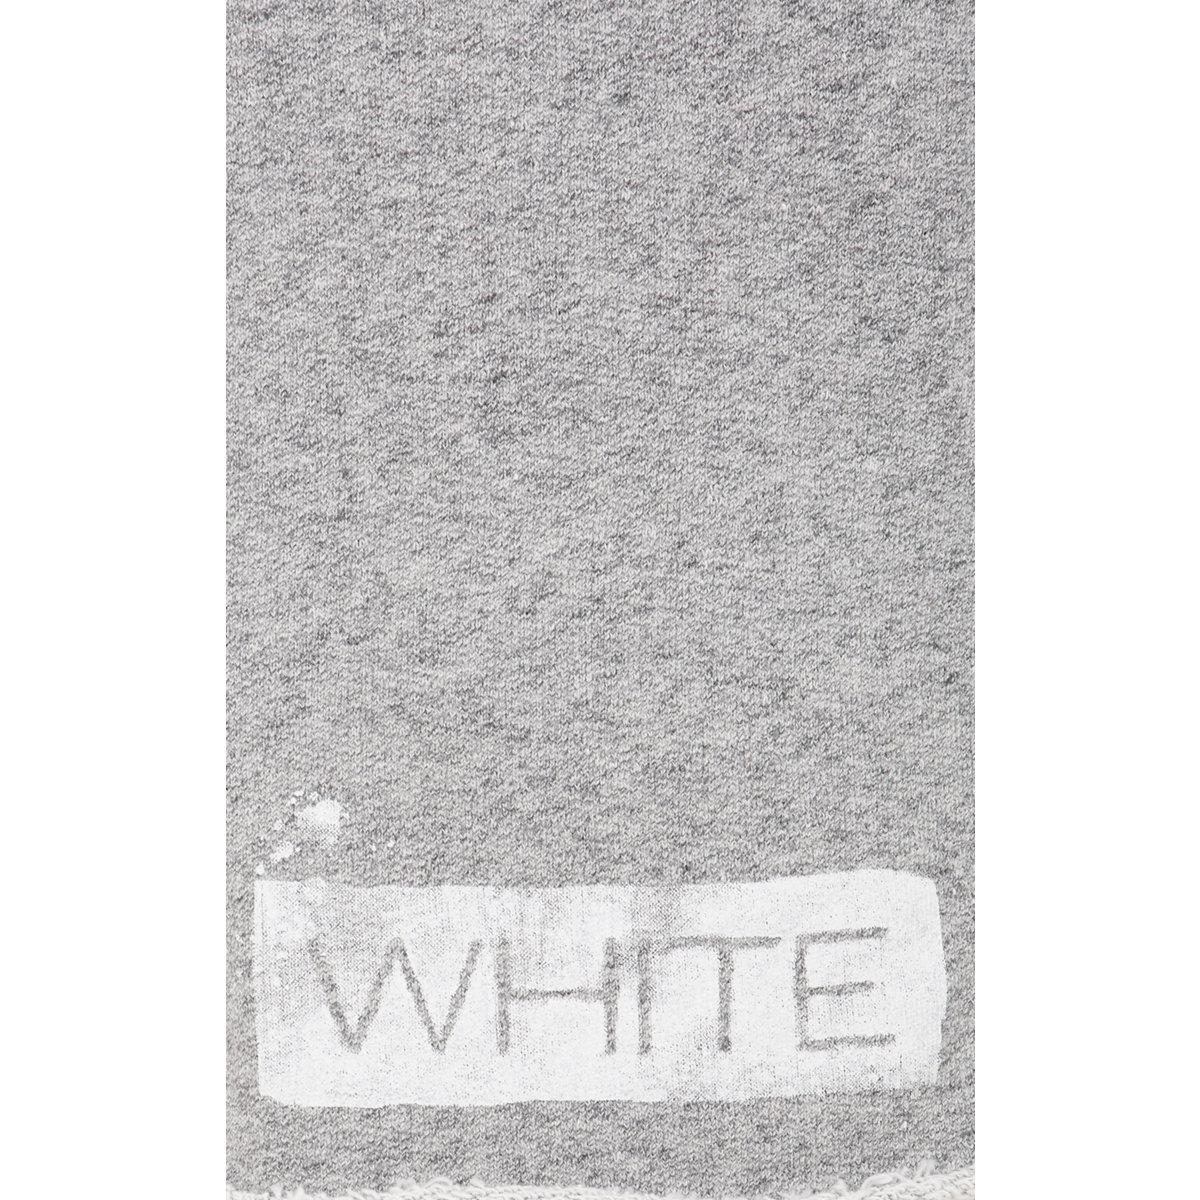 off white c o virgil abloh sweat shorts in gray for men lyst. Black Bedroom Furniture Sets. Home Design Ideas